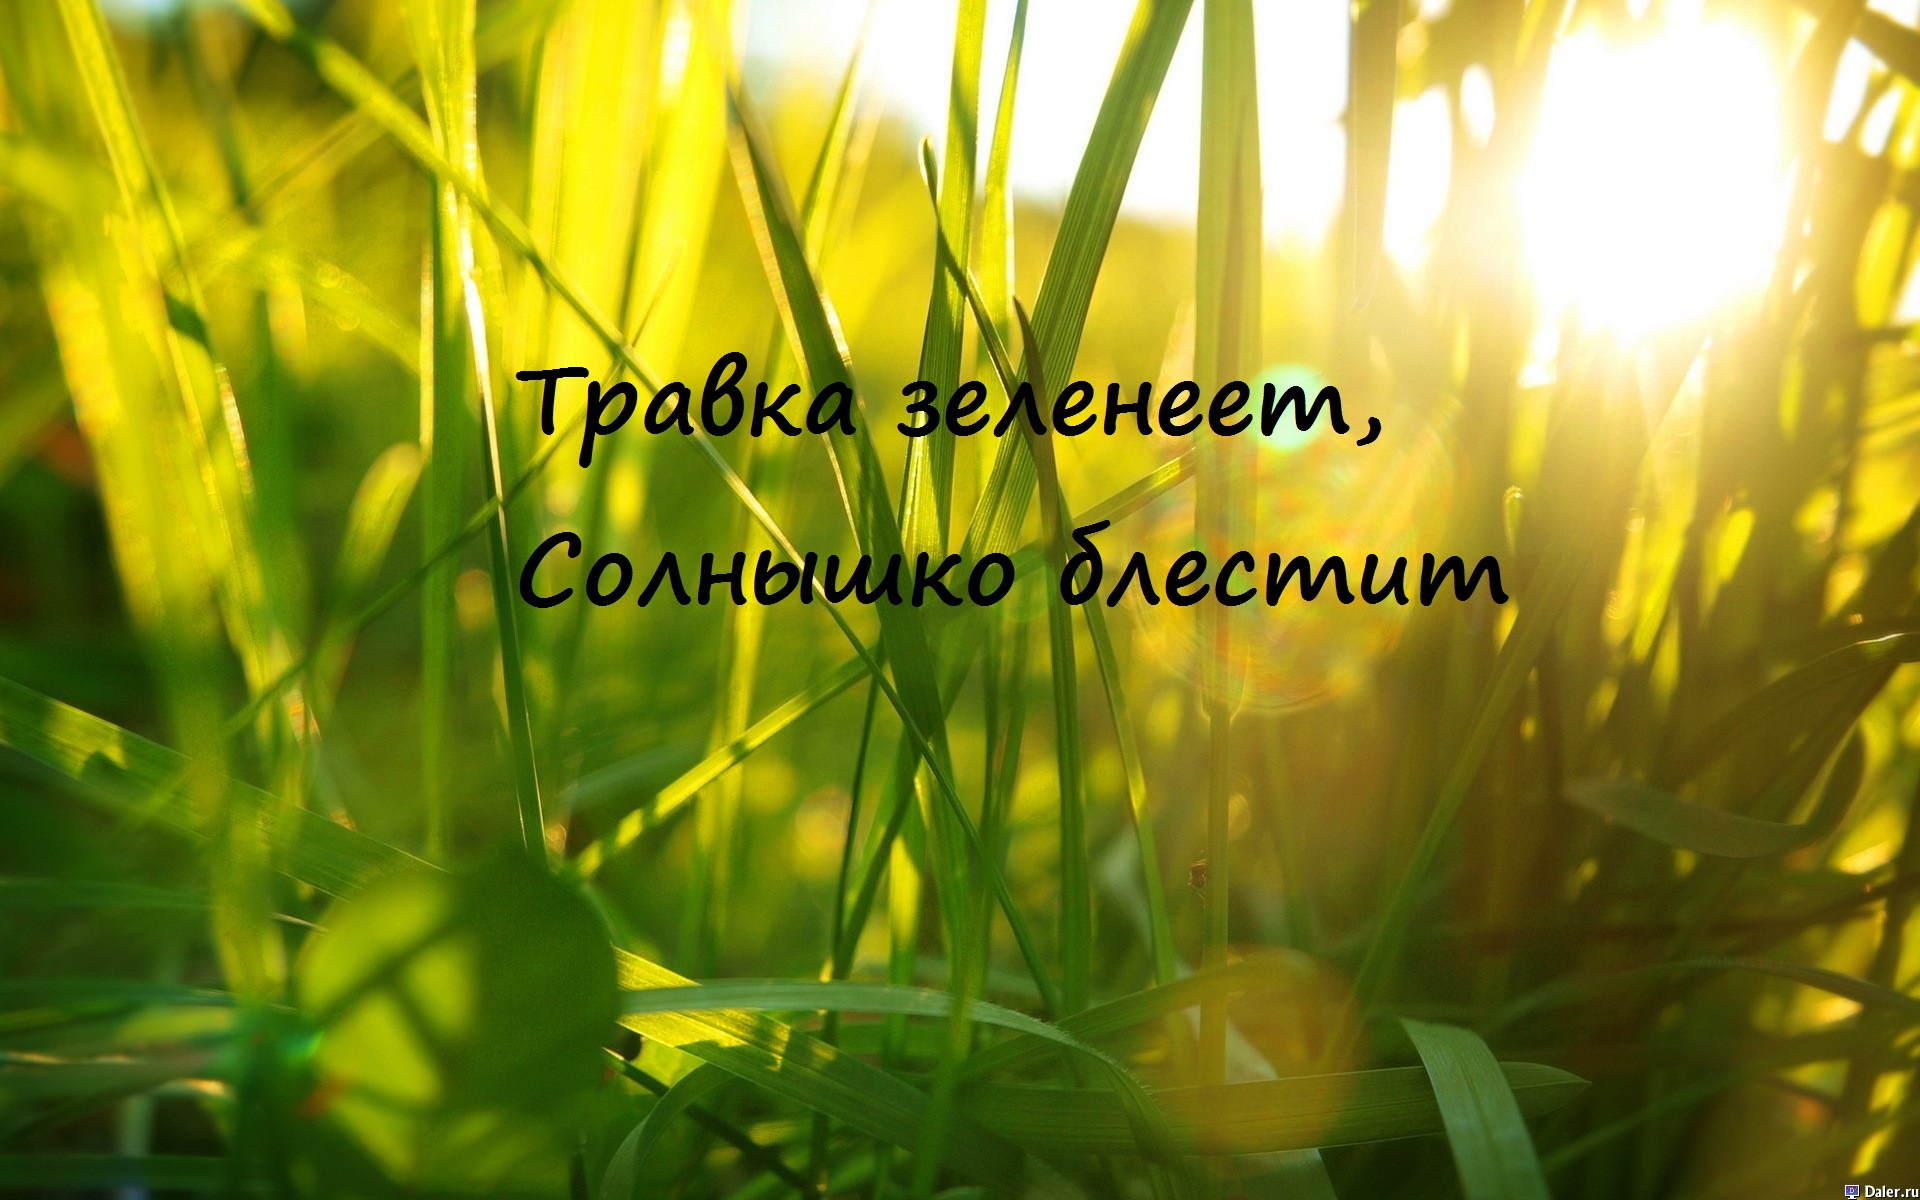 Лариса Черникова  chernikovaru